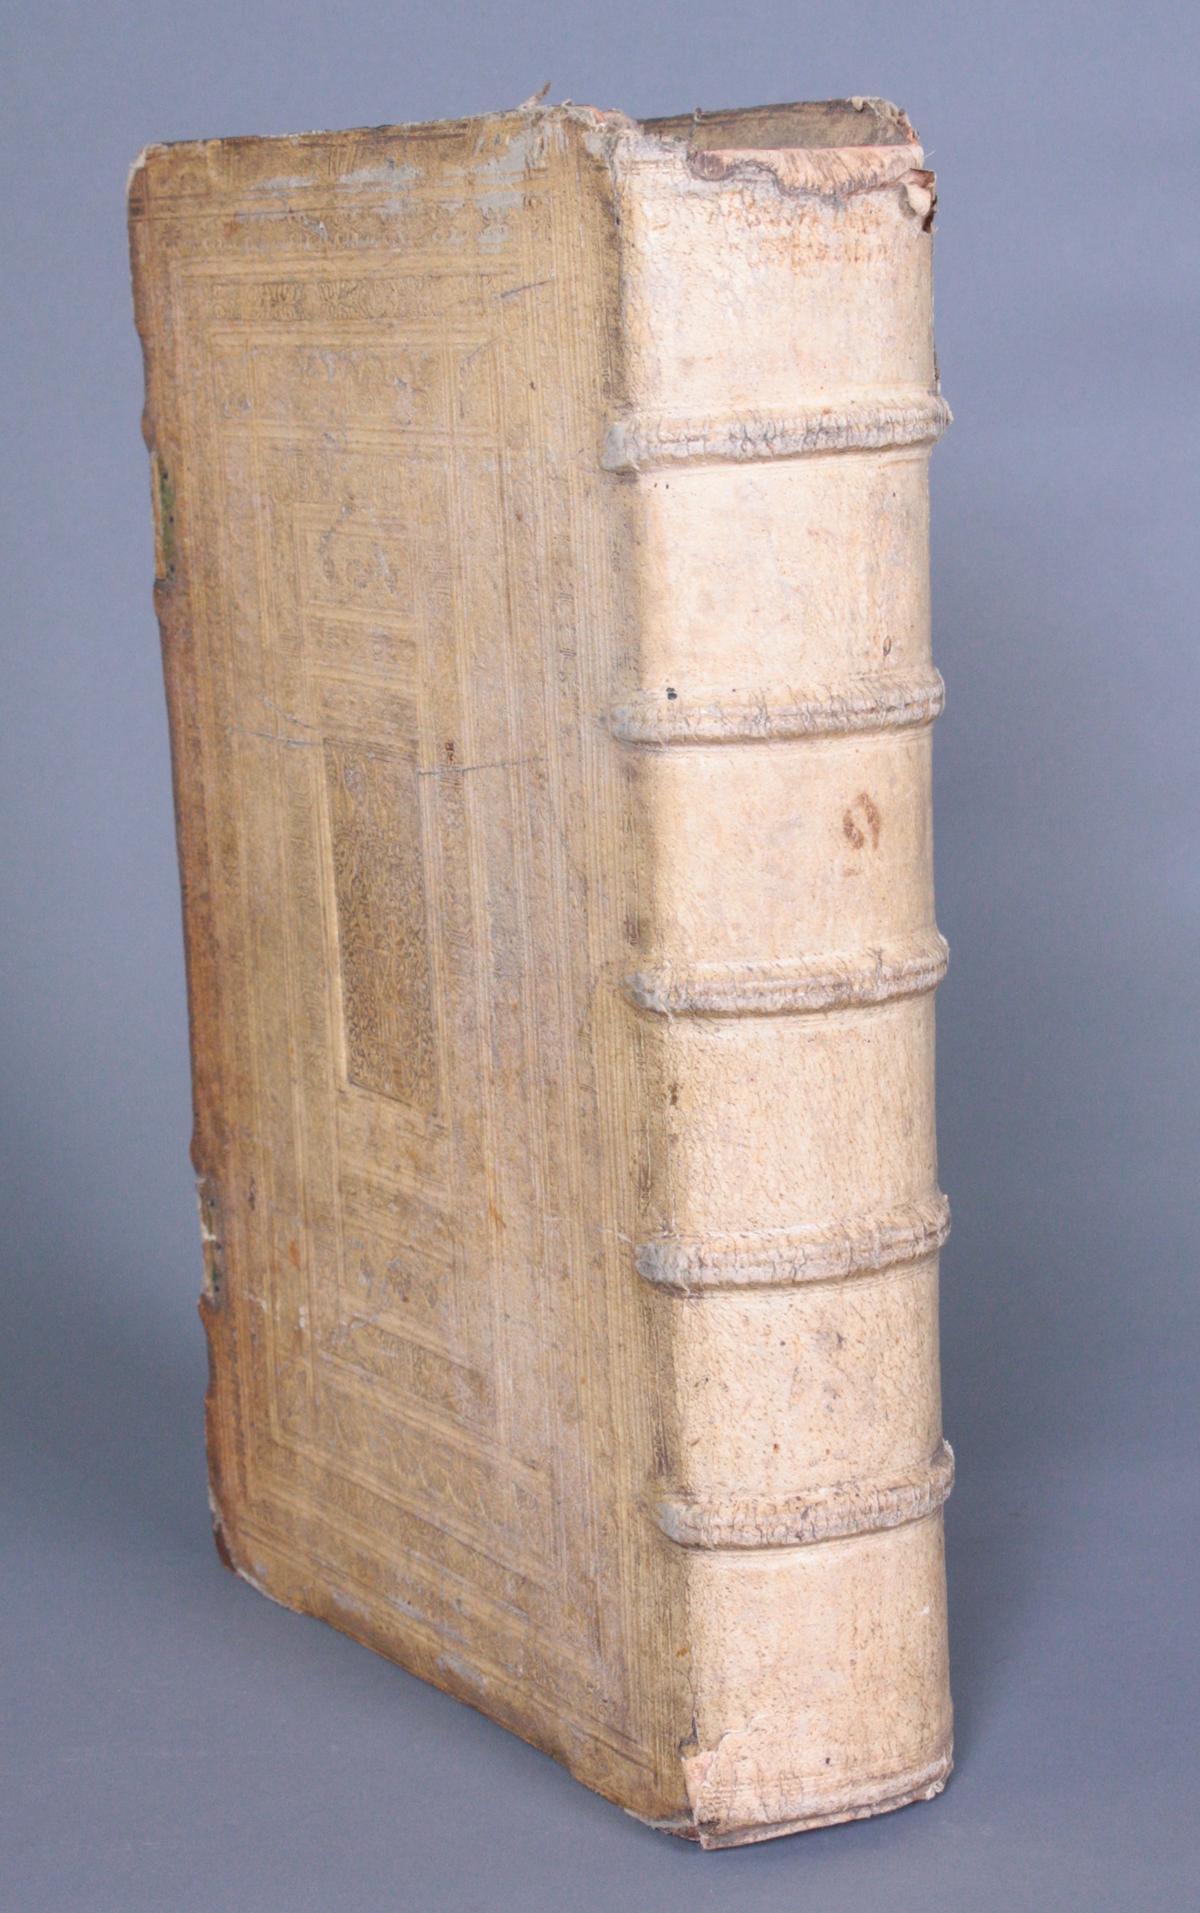 Griechische-Lateinische Bibel, Novum Testamentum 1582-23